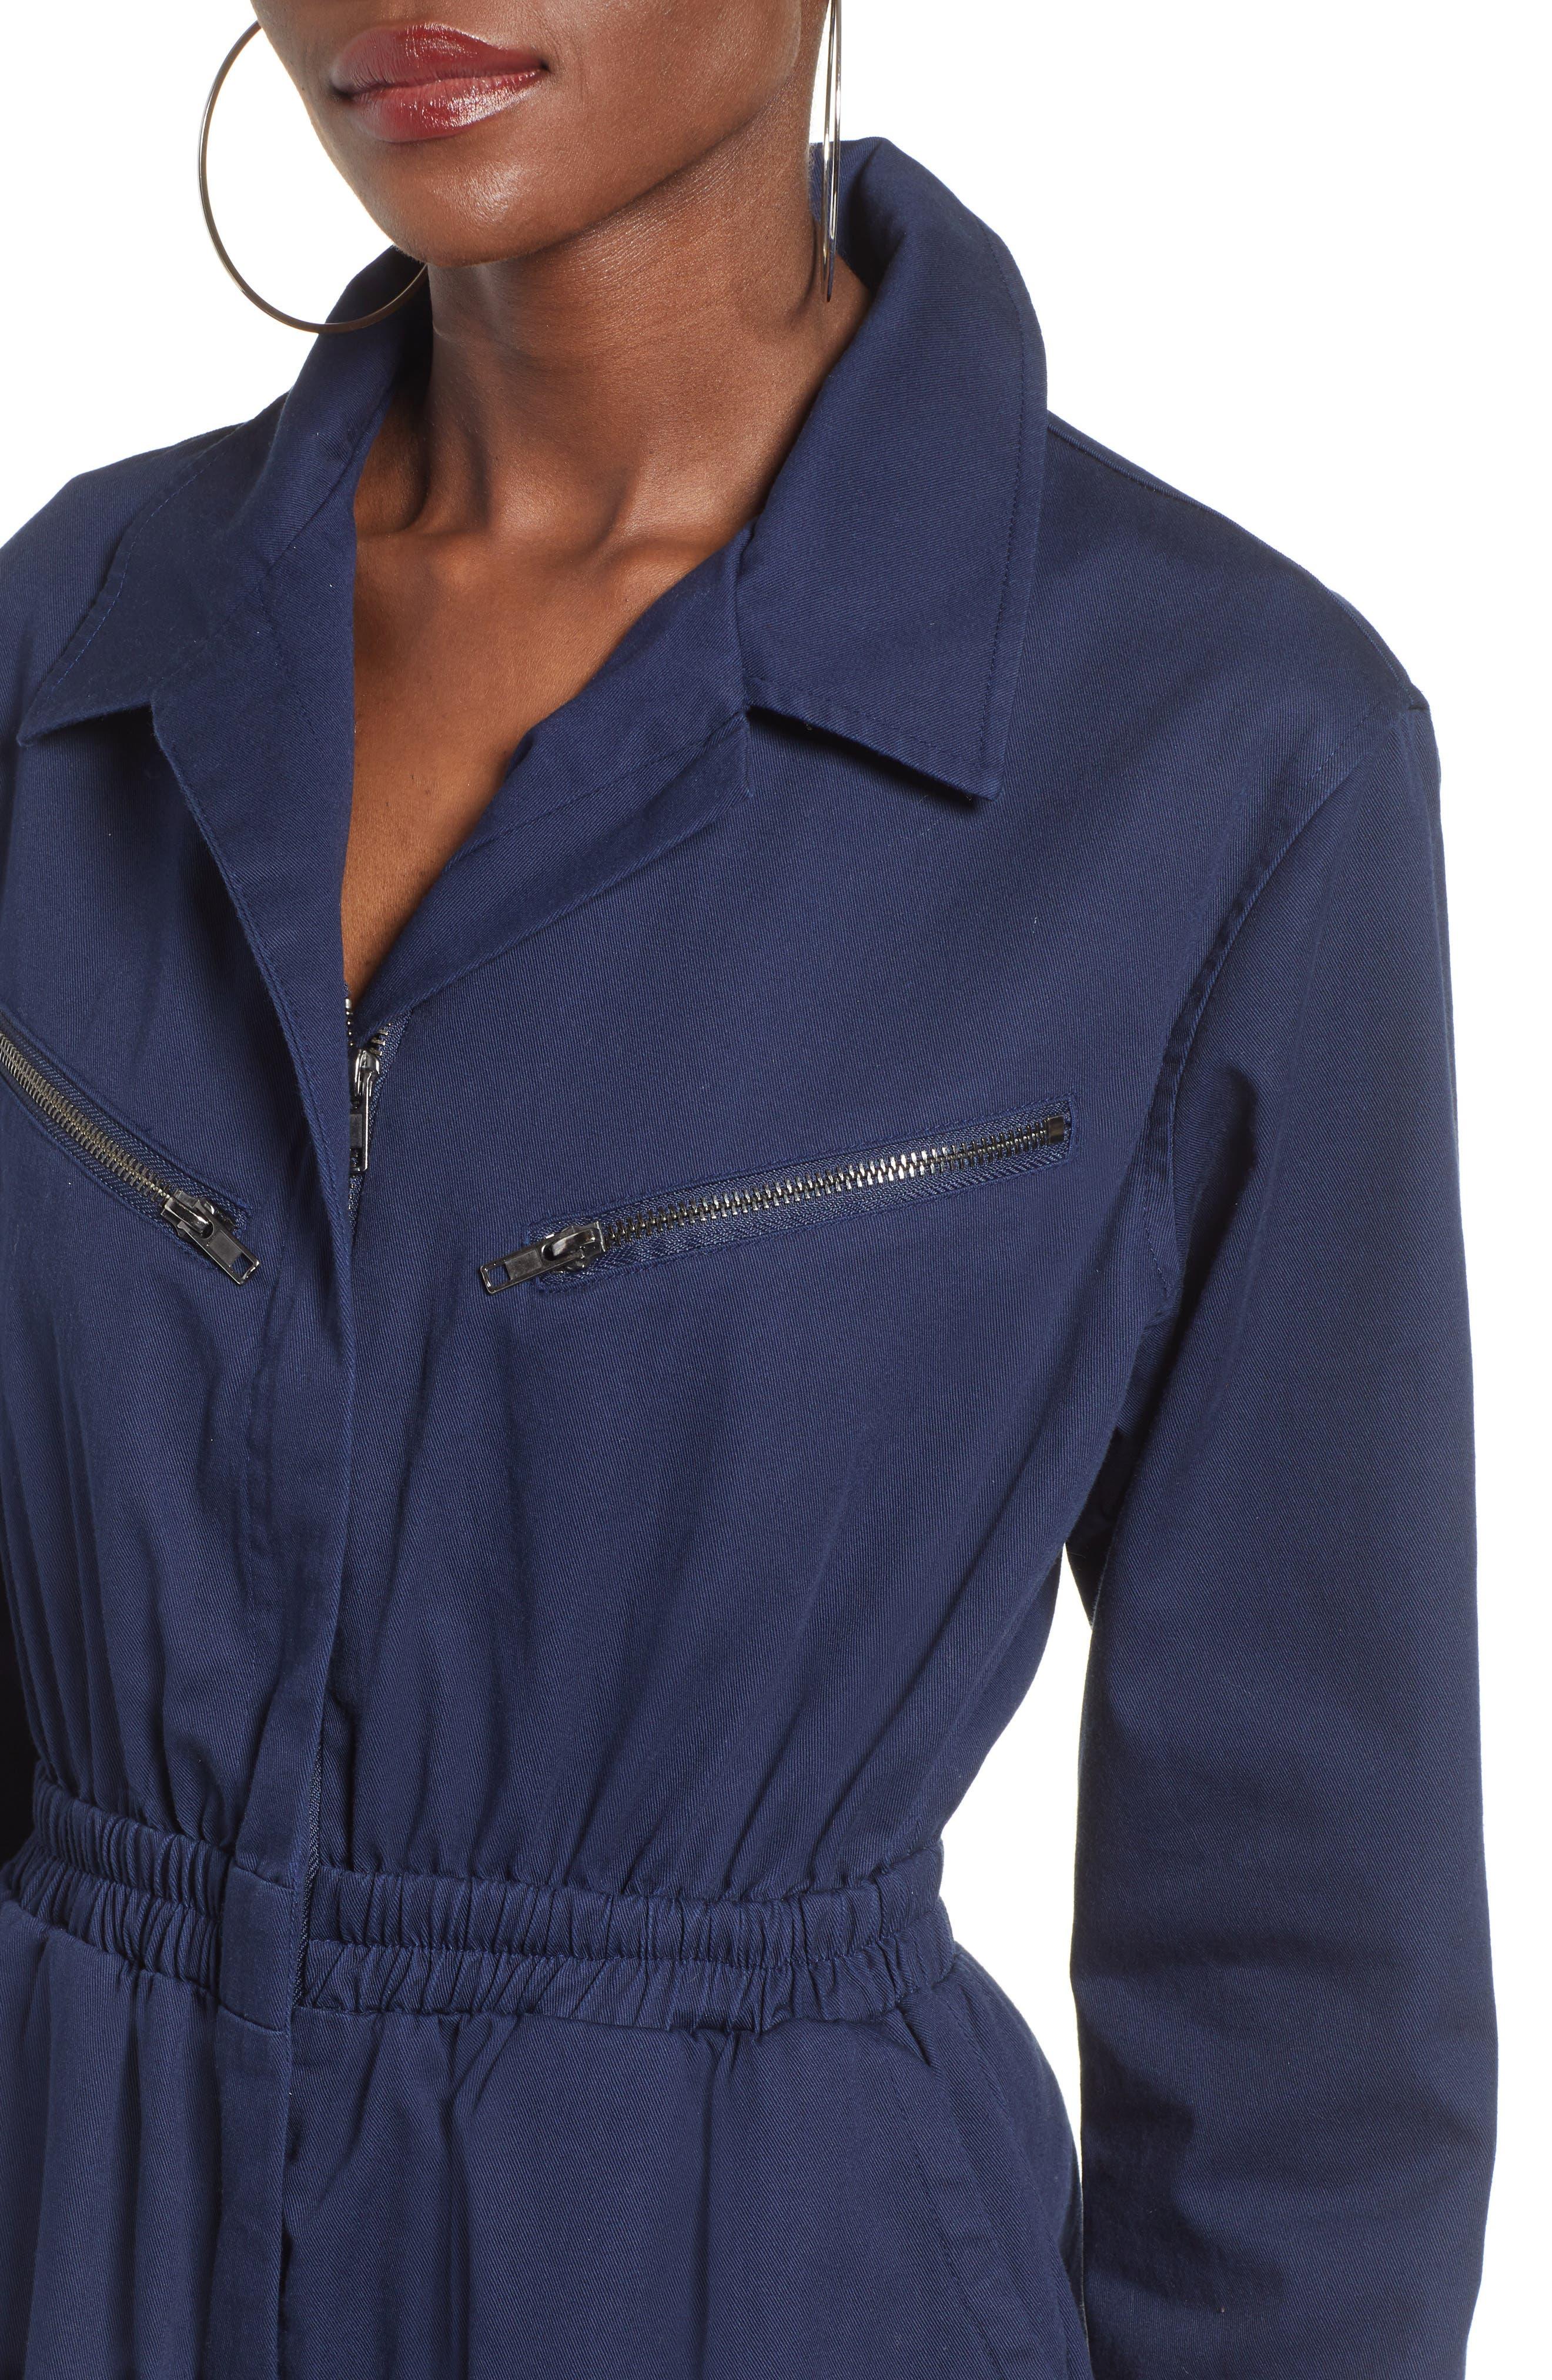 TEN SIXTY SHERMAN,                             Twill Workwear Jumpsuit,                             Alternate thumbnail 4, color,                             OXFORD BLUE